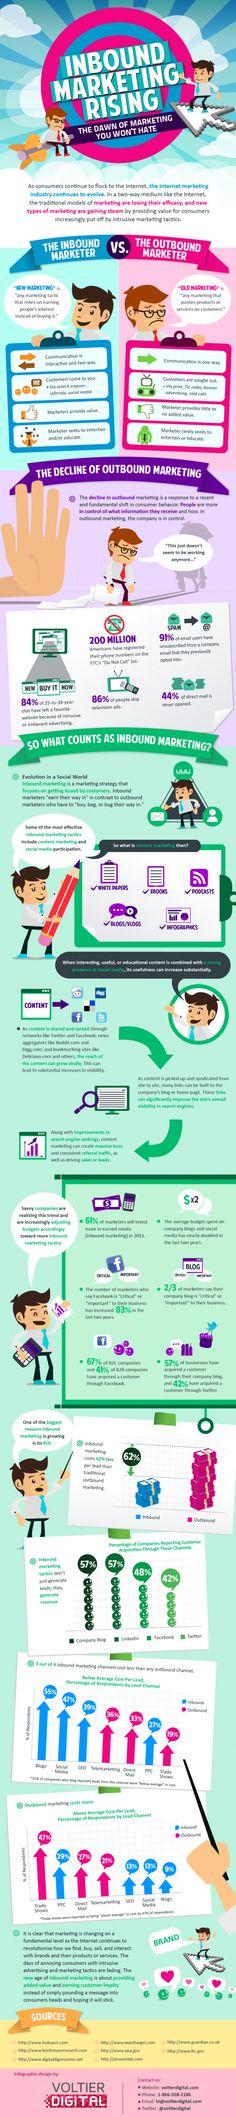 http://lewisbertolucci.com/wordpress/wp-content/uploads/Inbound-Outbound-Marketing-Infographic.png